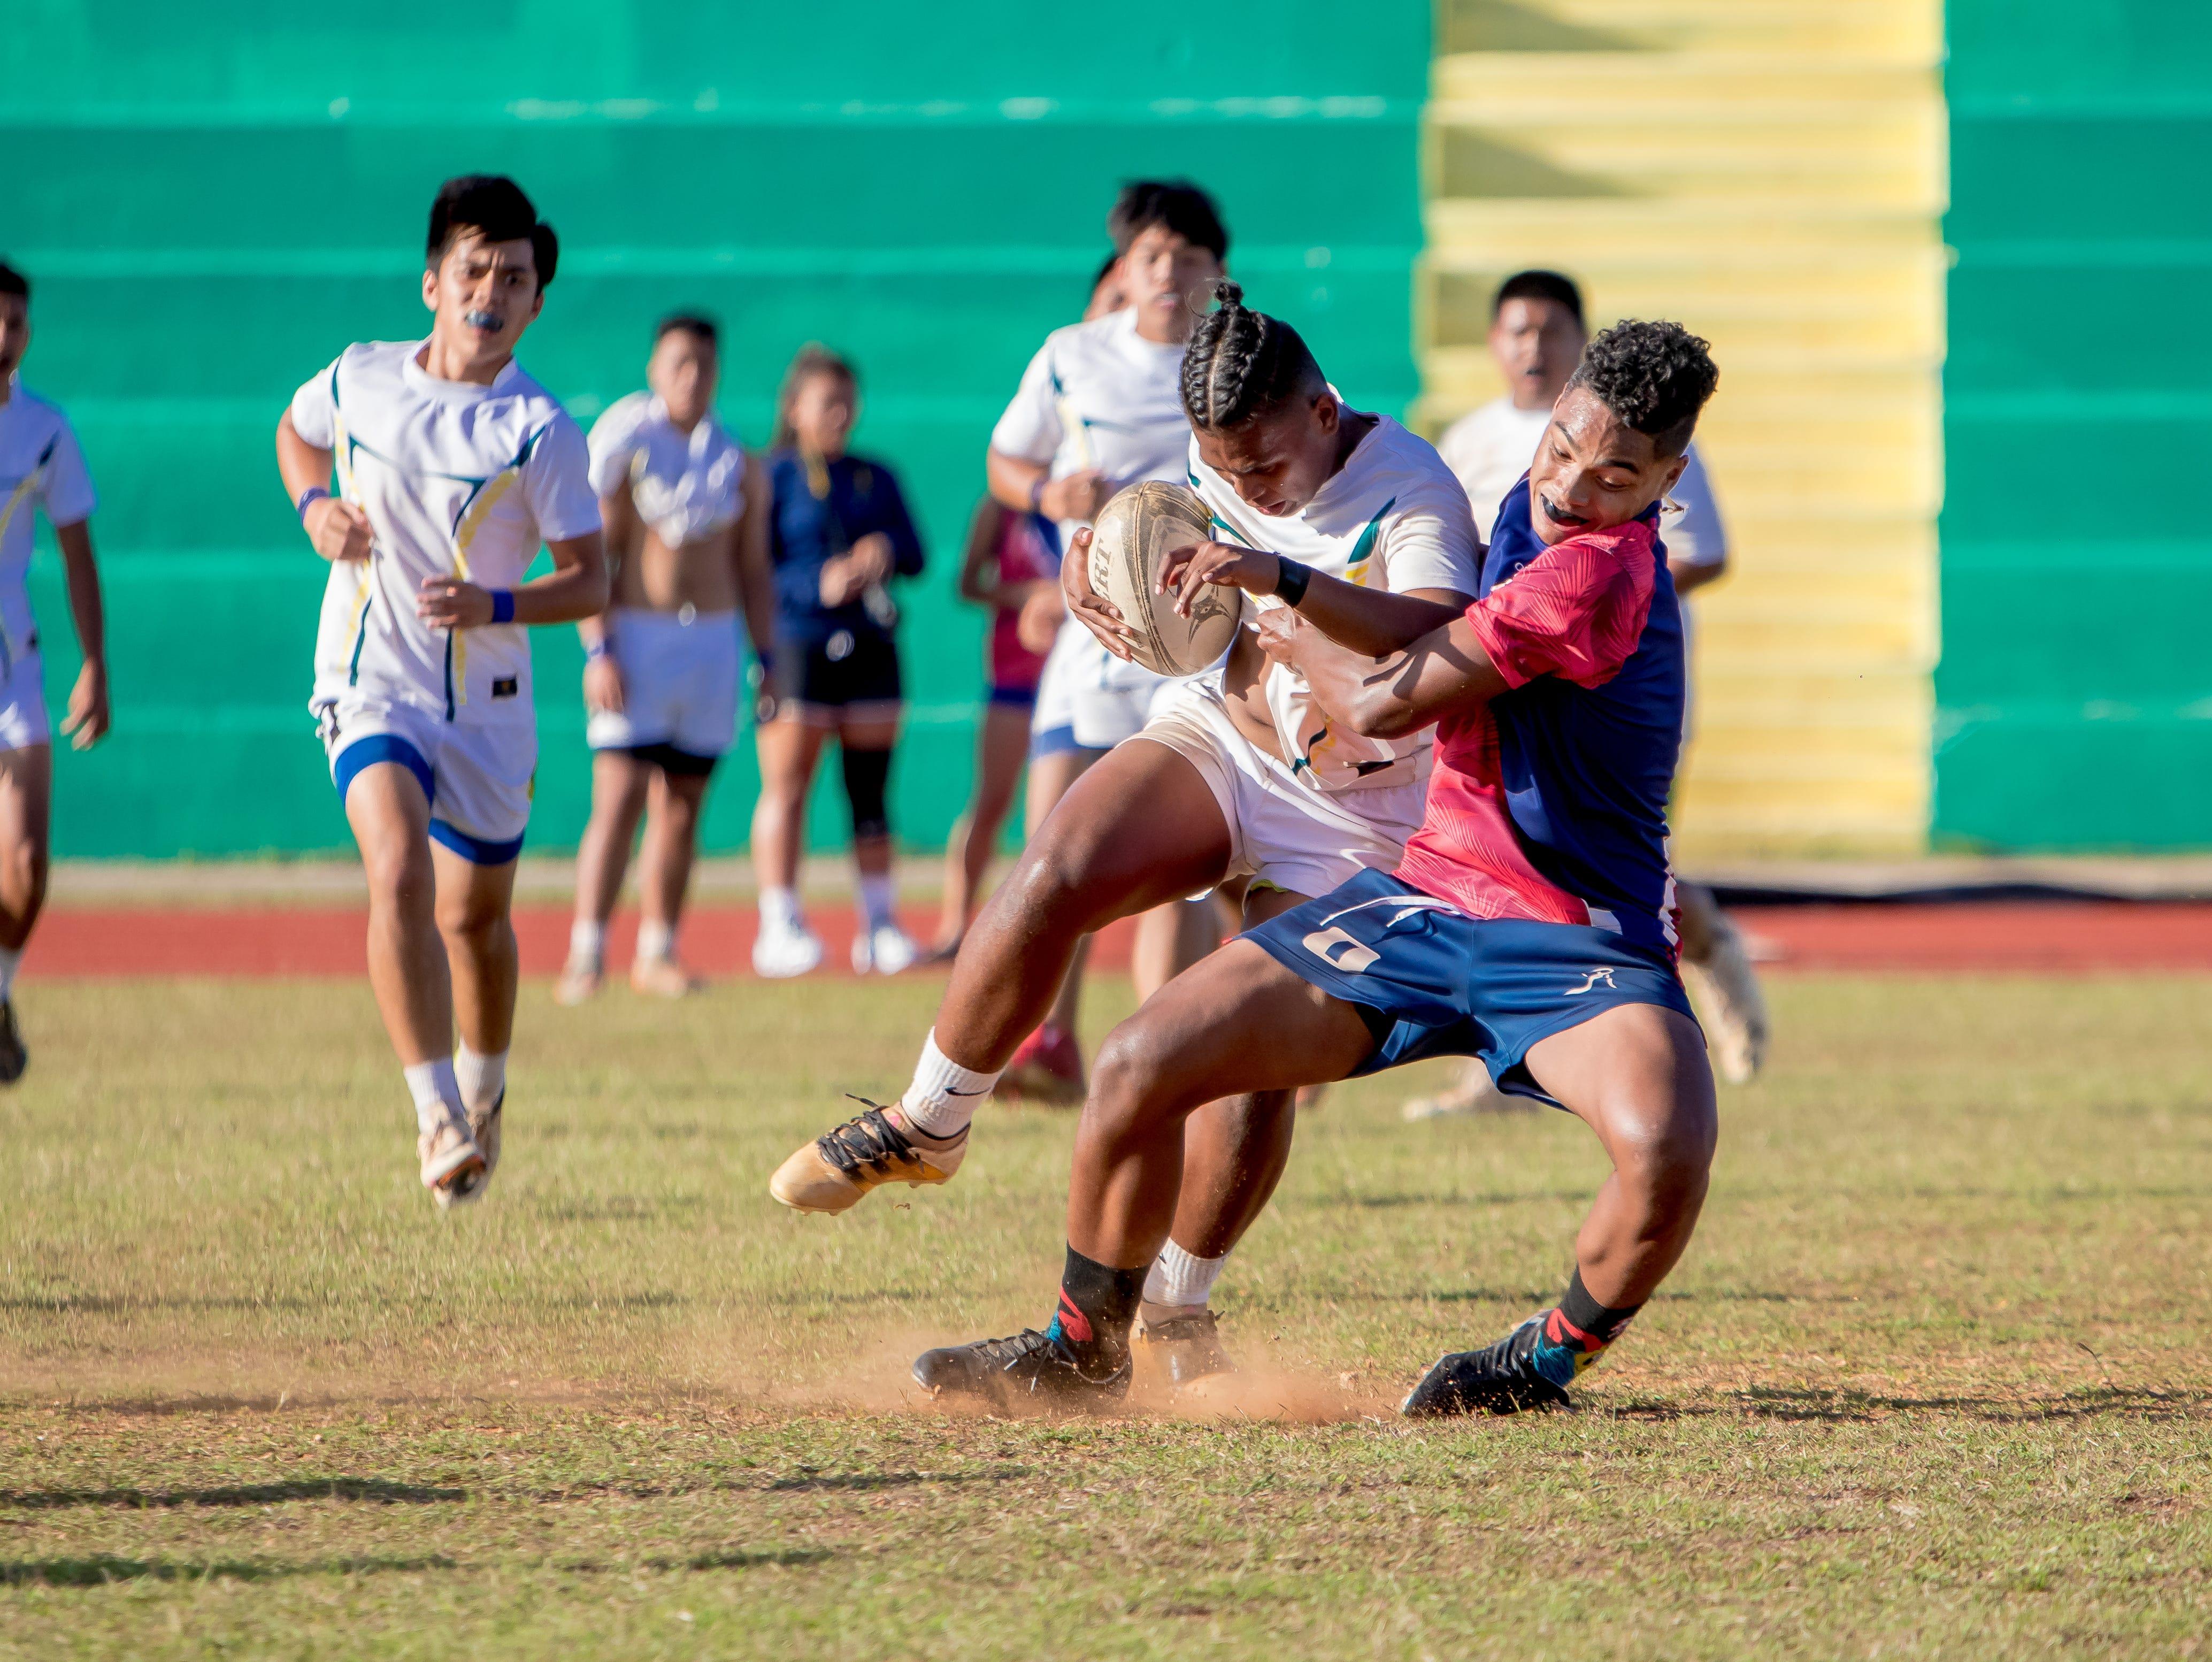 A John F. Kennedy High School rugger gets tackled by an Okkodo High School player during an IIAAG/GRFU Boys Rugby match at Ramsey Field on March 6.